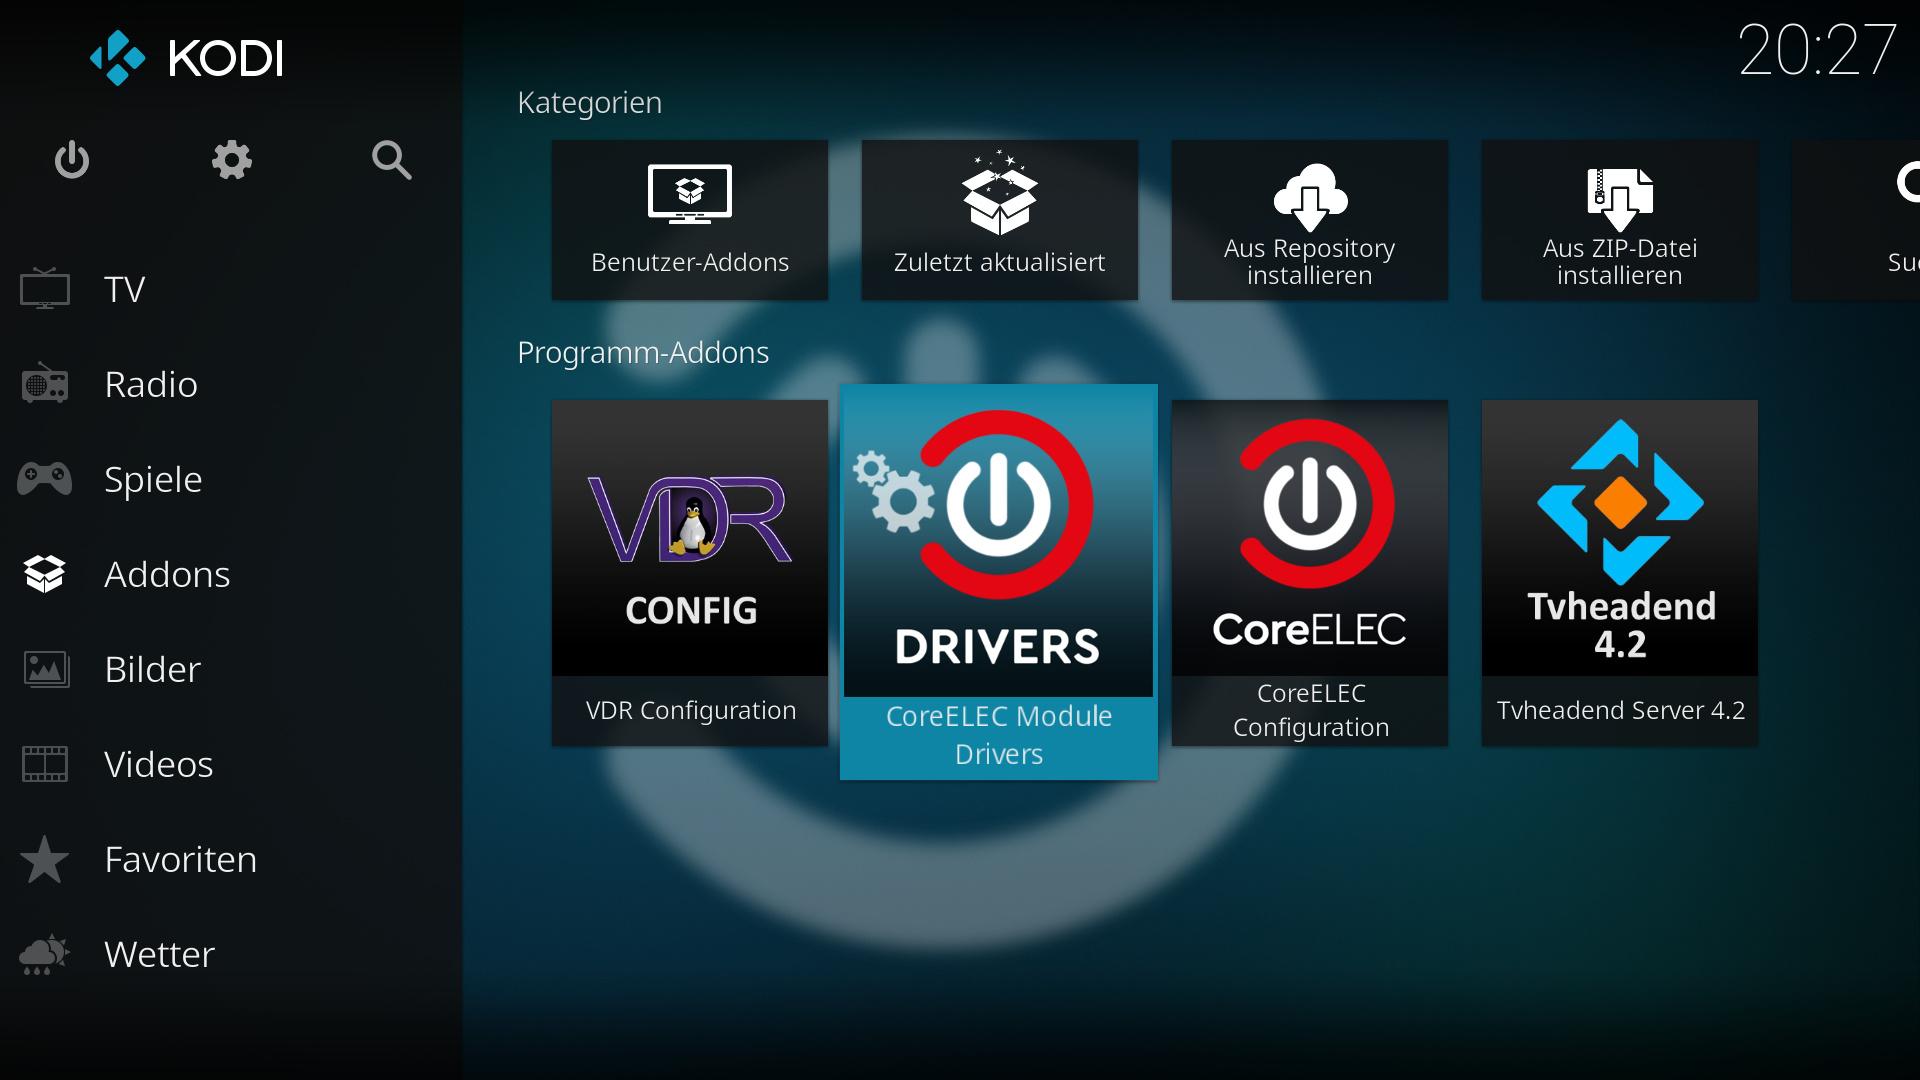 TVHeadend Server - KIII Pro Tuner not found - Tvheadend - CoreELEC